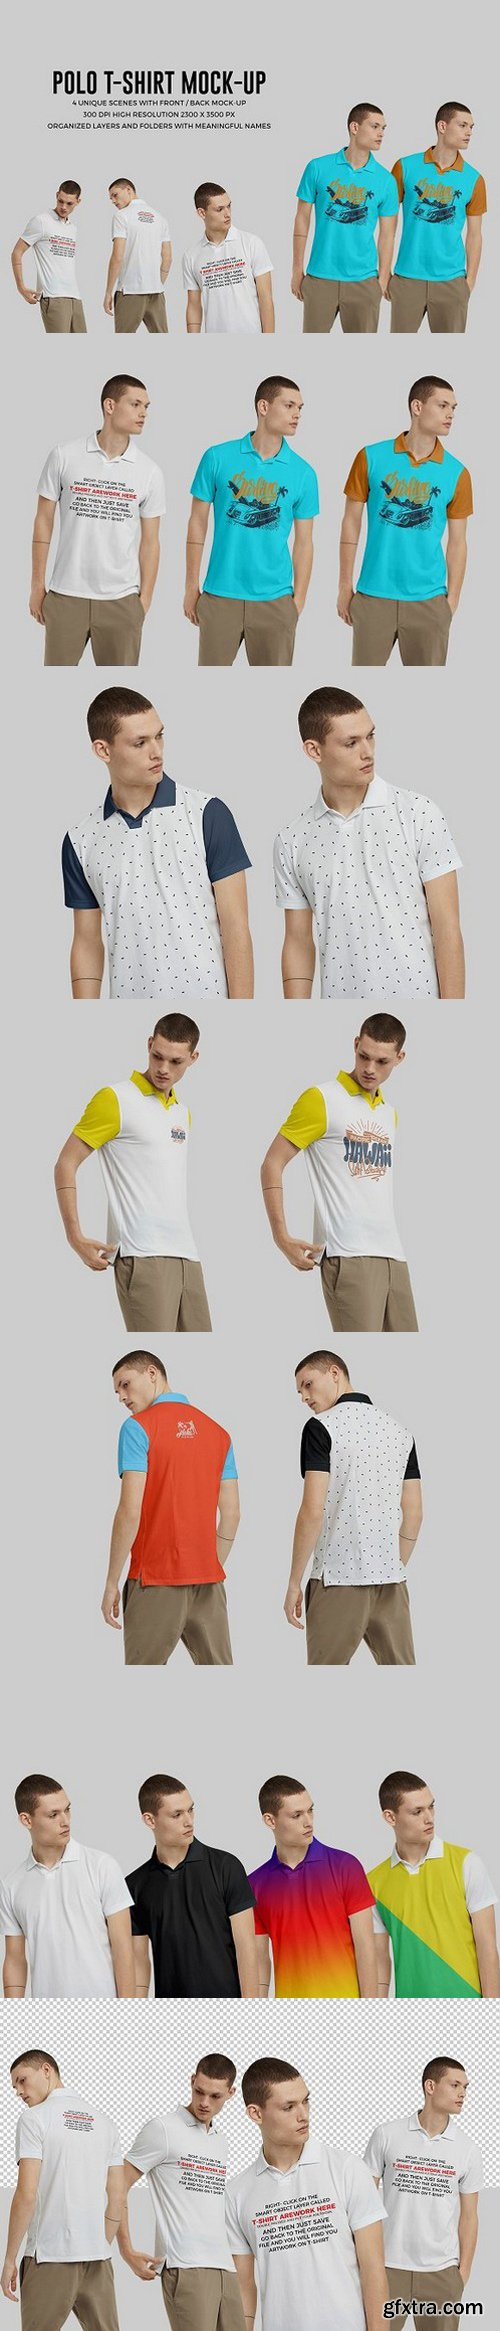 CM - Polo Shirt Mock-Up 1482354